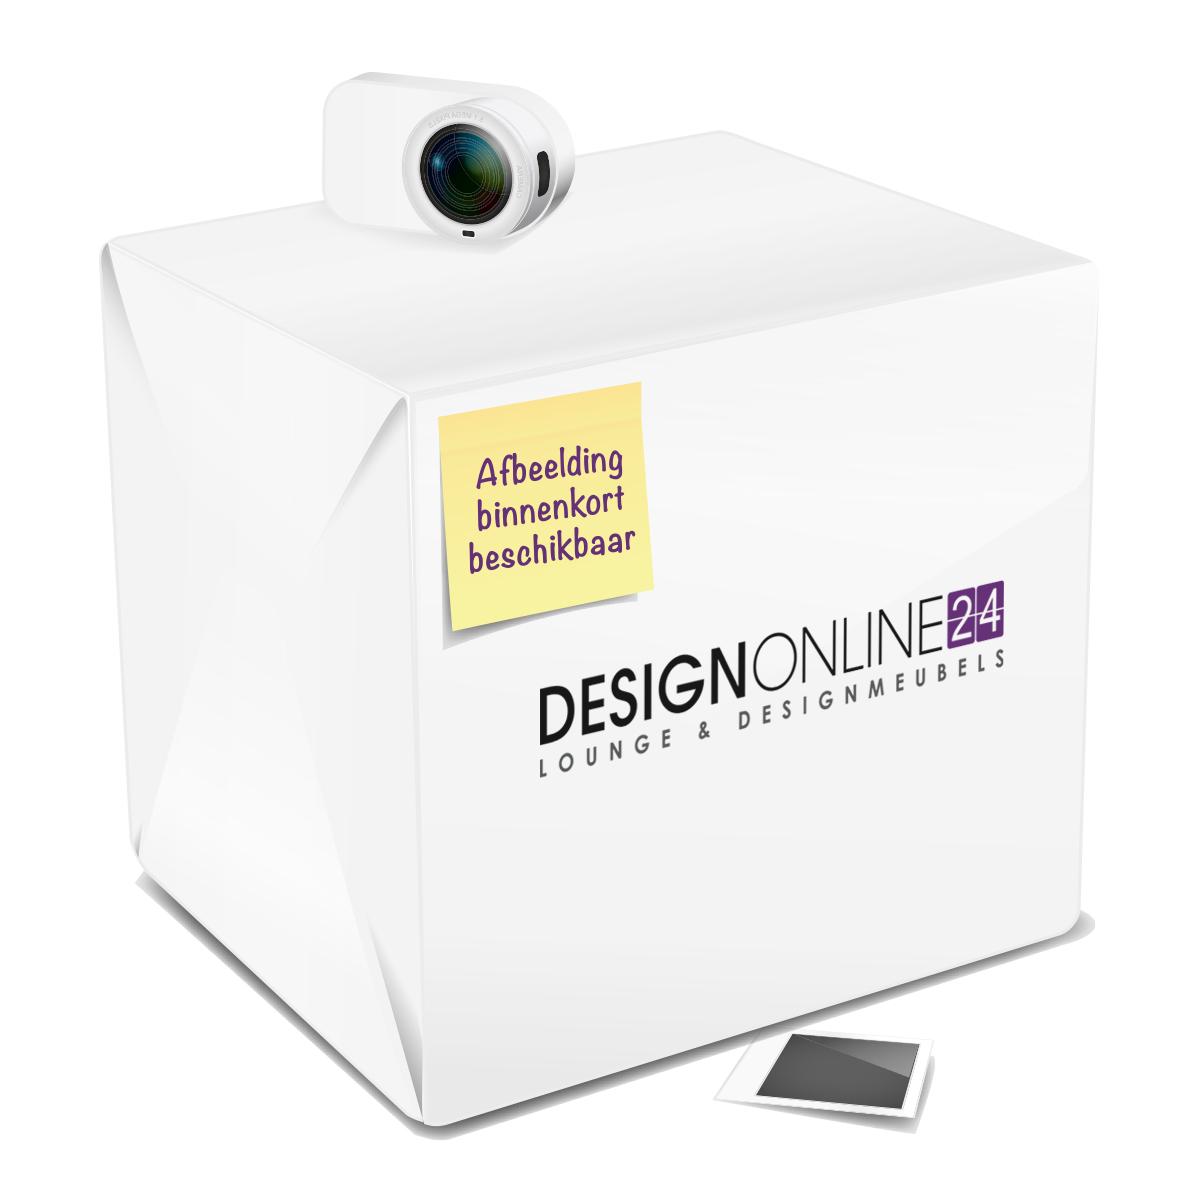 Zuiver Zuiver Vloerkleed Malva L200 x B300 cm - Stof Lichtgrijs